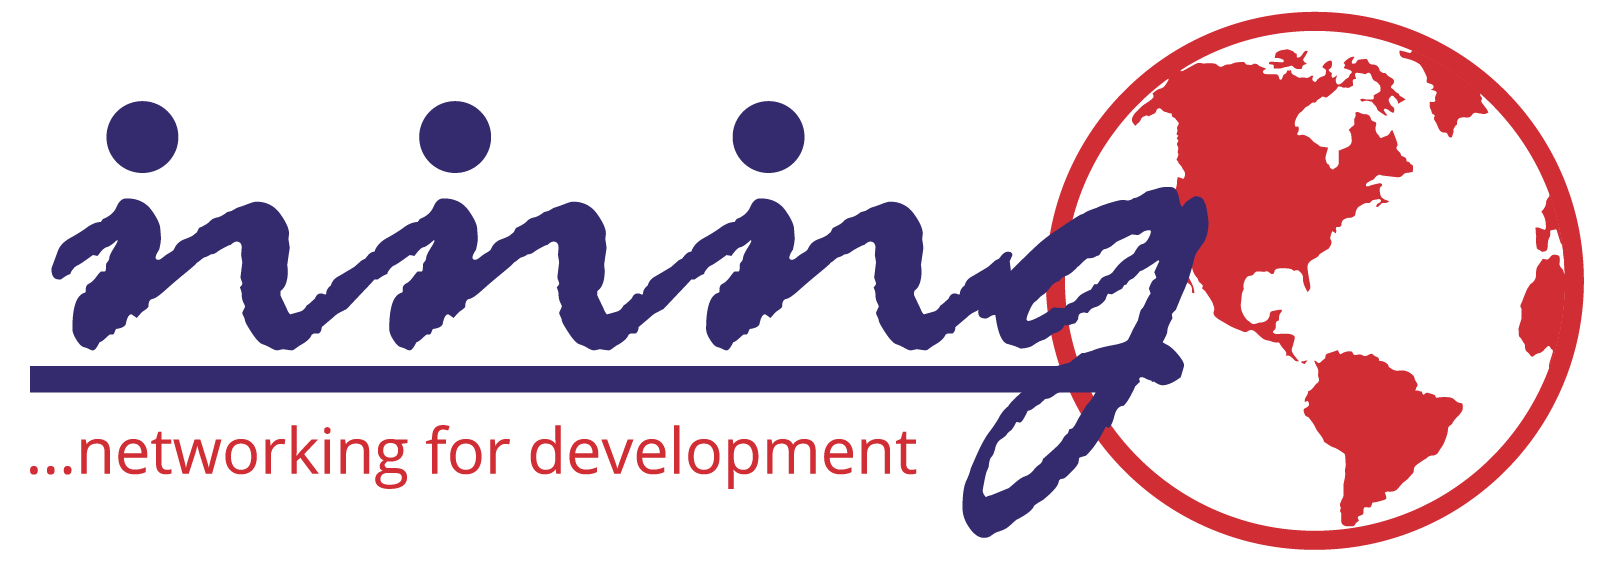 https://campaign-image.com/zohocampaigns/492296000002924006_zc_v37_nnngo_logo_(1).png